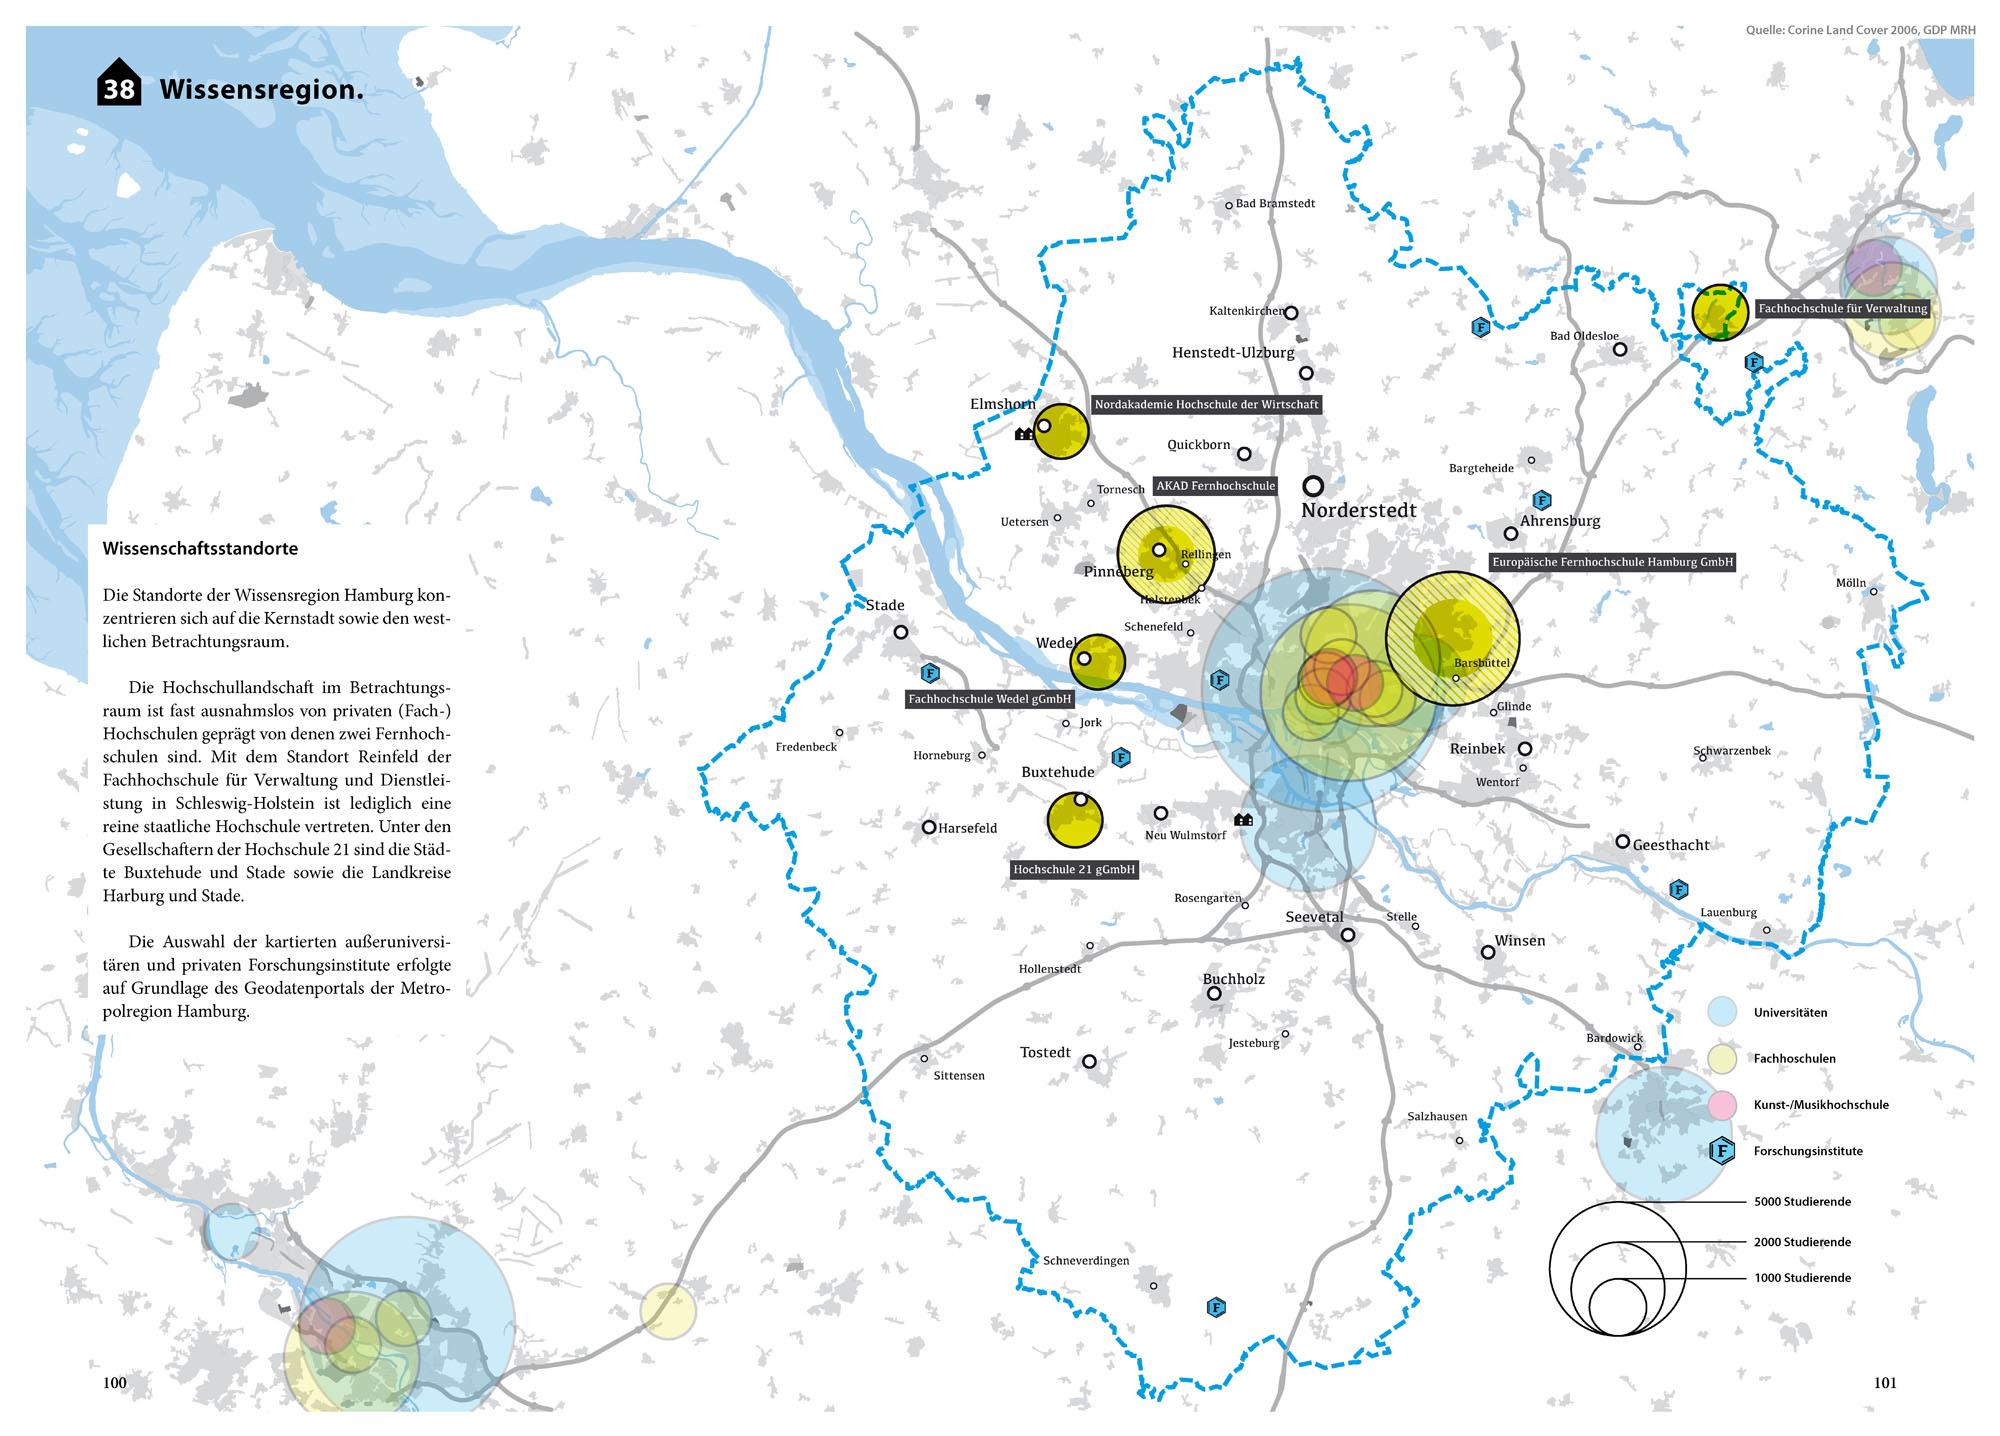 Suburbia Atlas Hamburg Stadteingang Typologien Vorort Karte Wissen Wissenschaft Wissenschaftsstandorte Hochschulen Karte